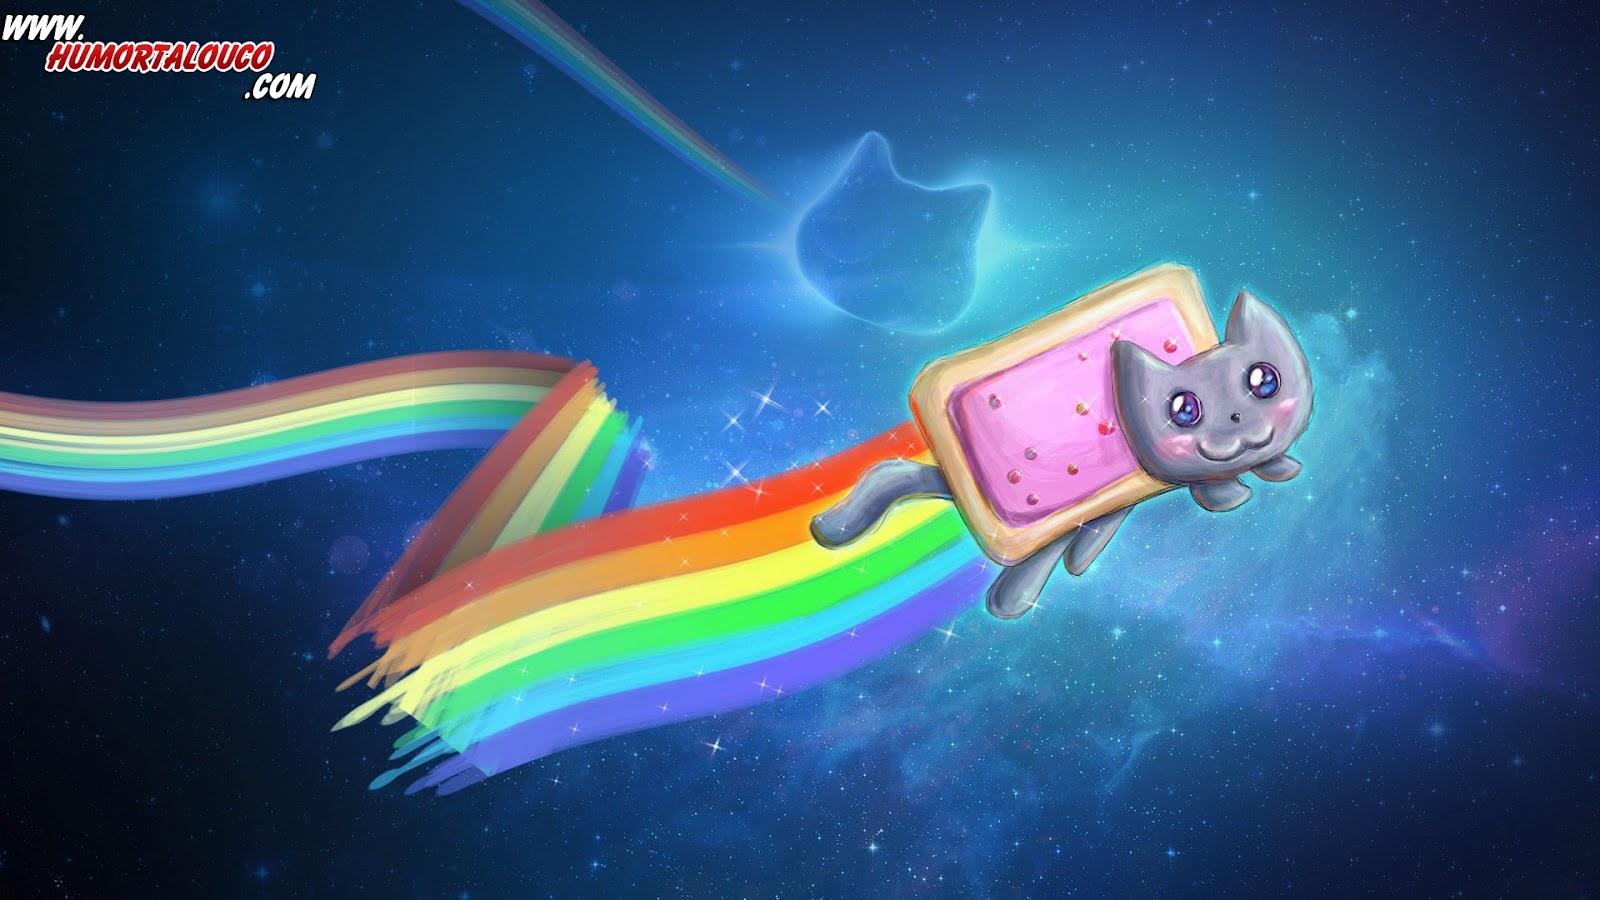 Wallpaper Memes: Nyan Cat - HumorTaLouco.com